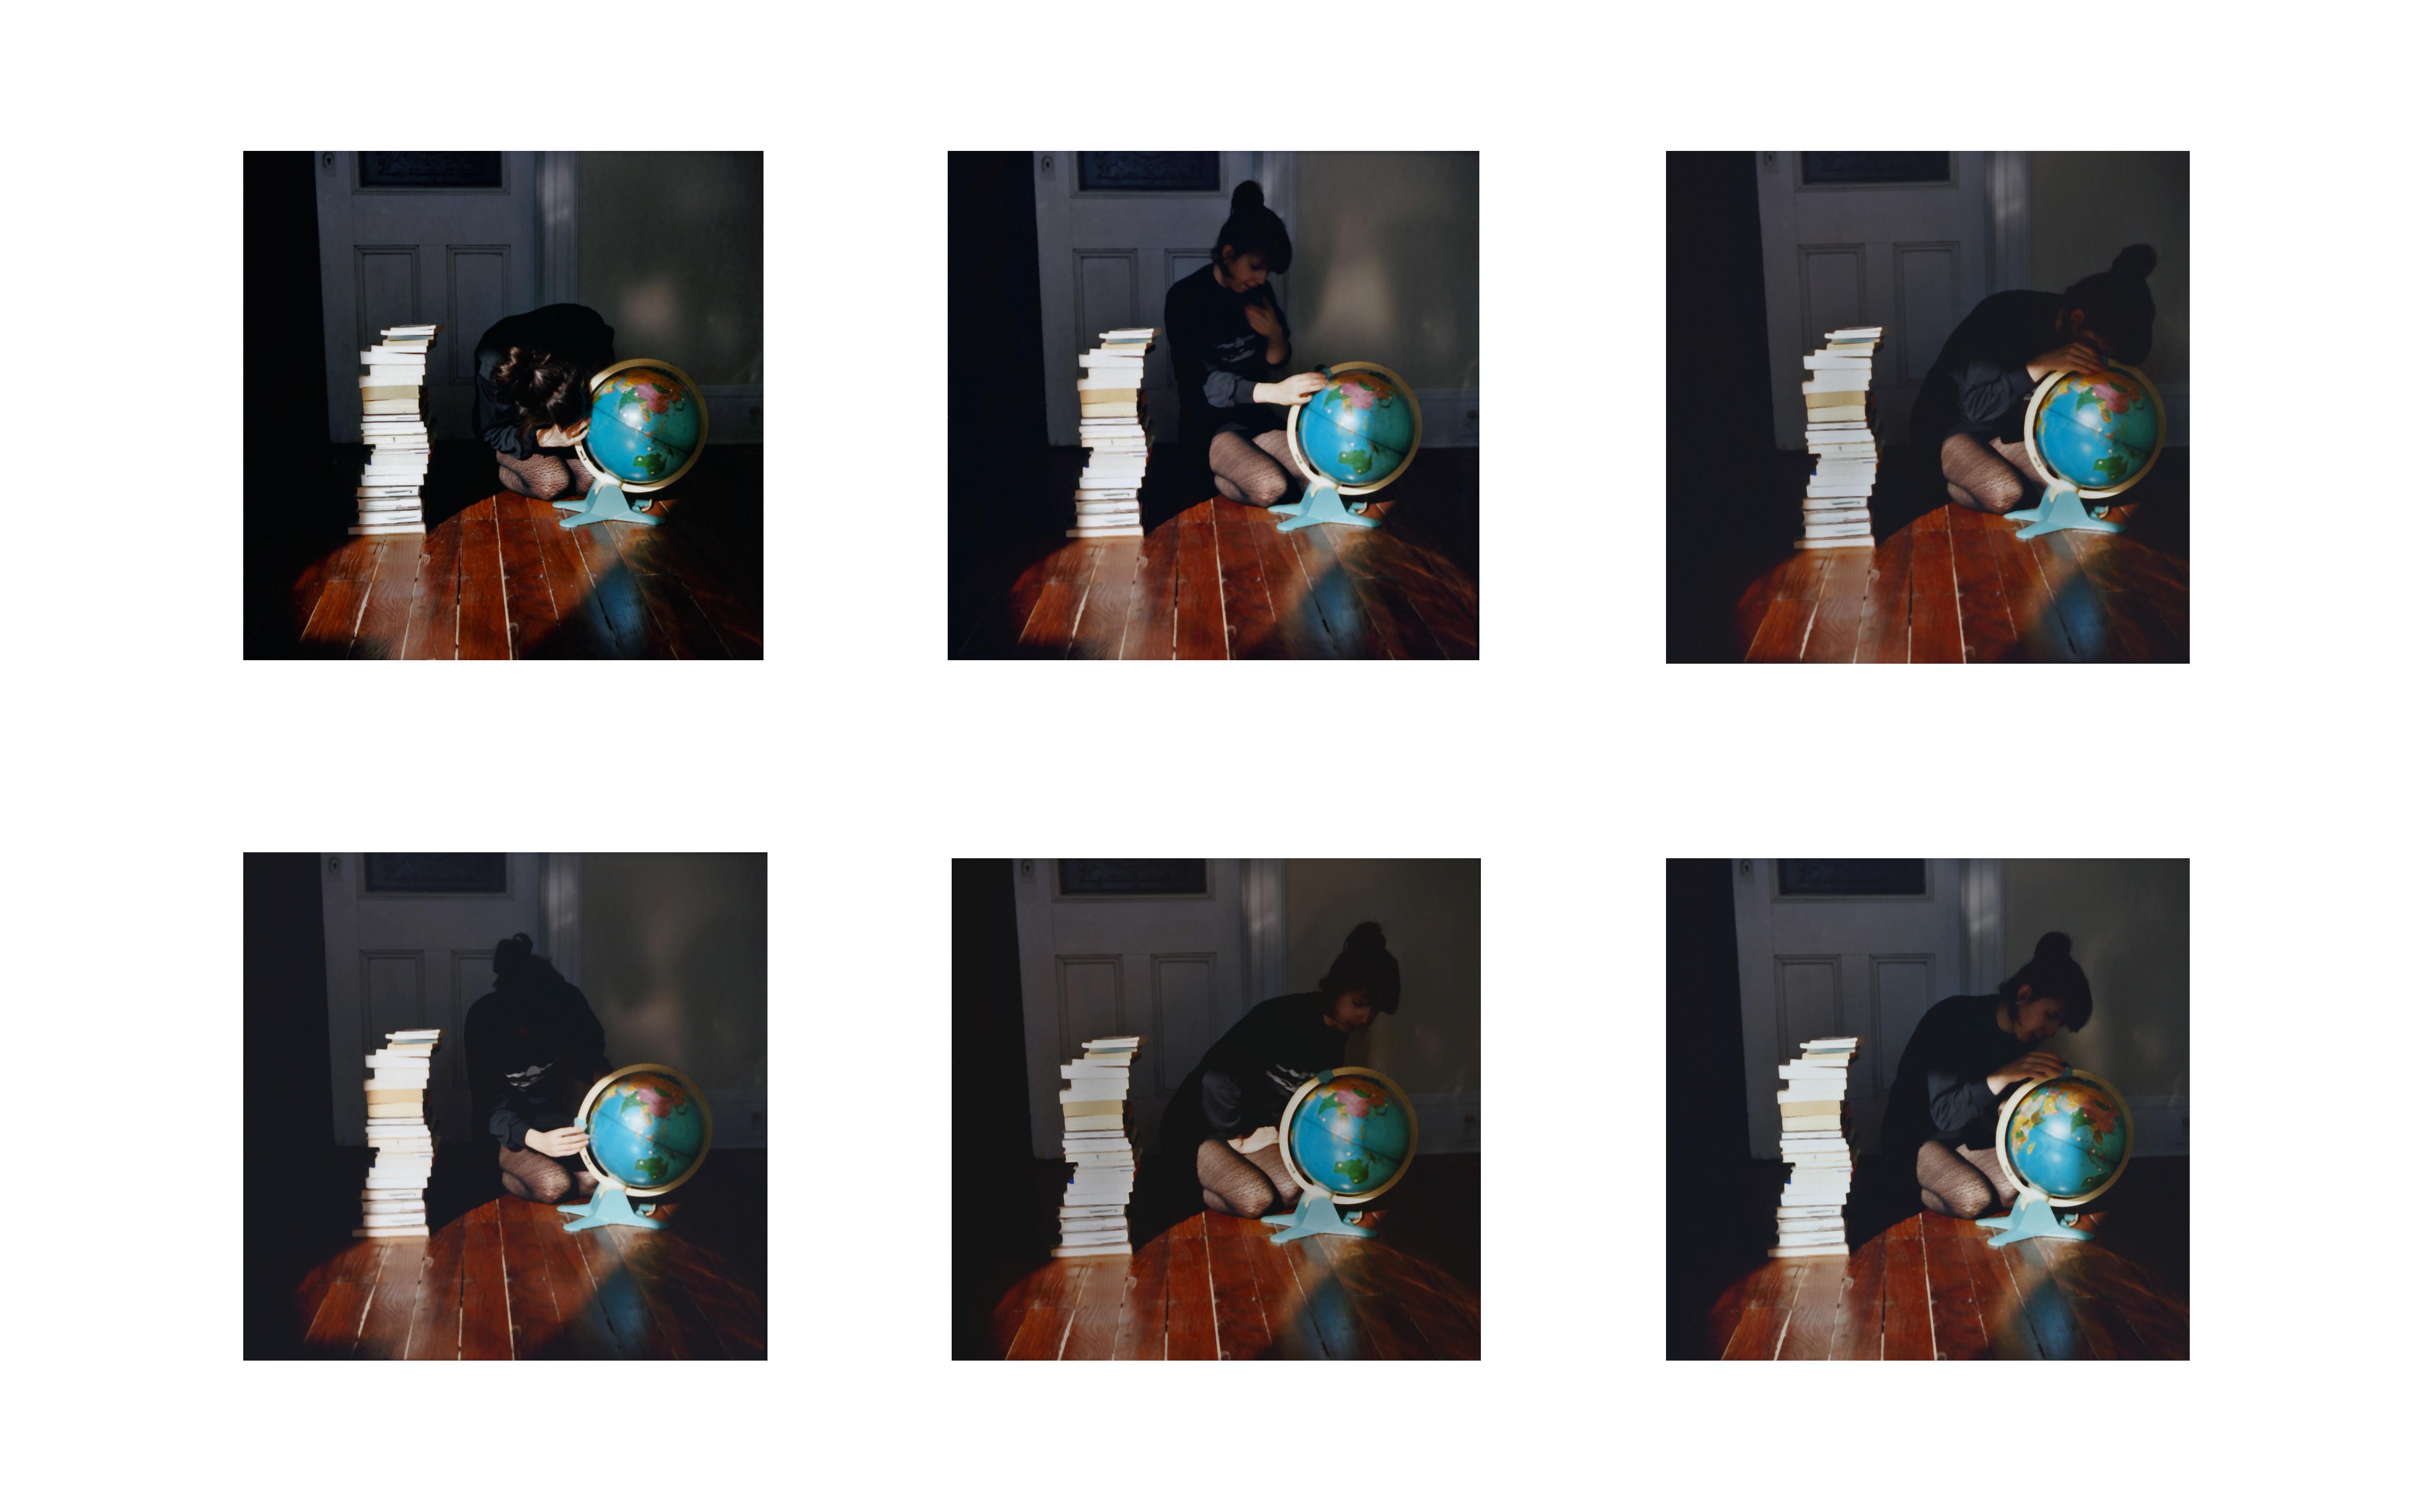 Ève K. Tremblay, Lire un globe (1 à 6), 2011, épreuve chromogène, c-print, éd. 5, 5